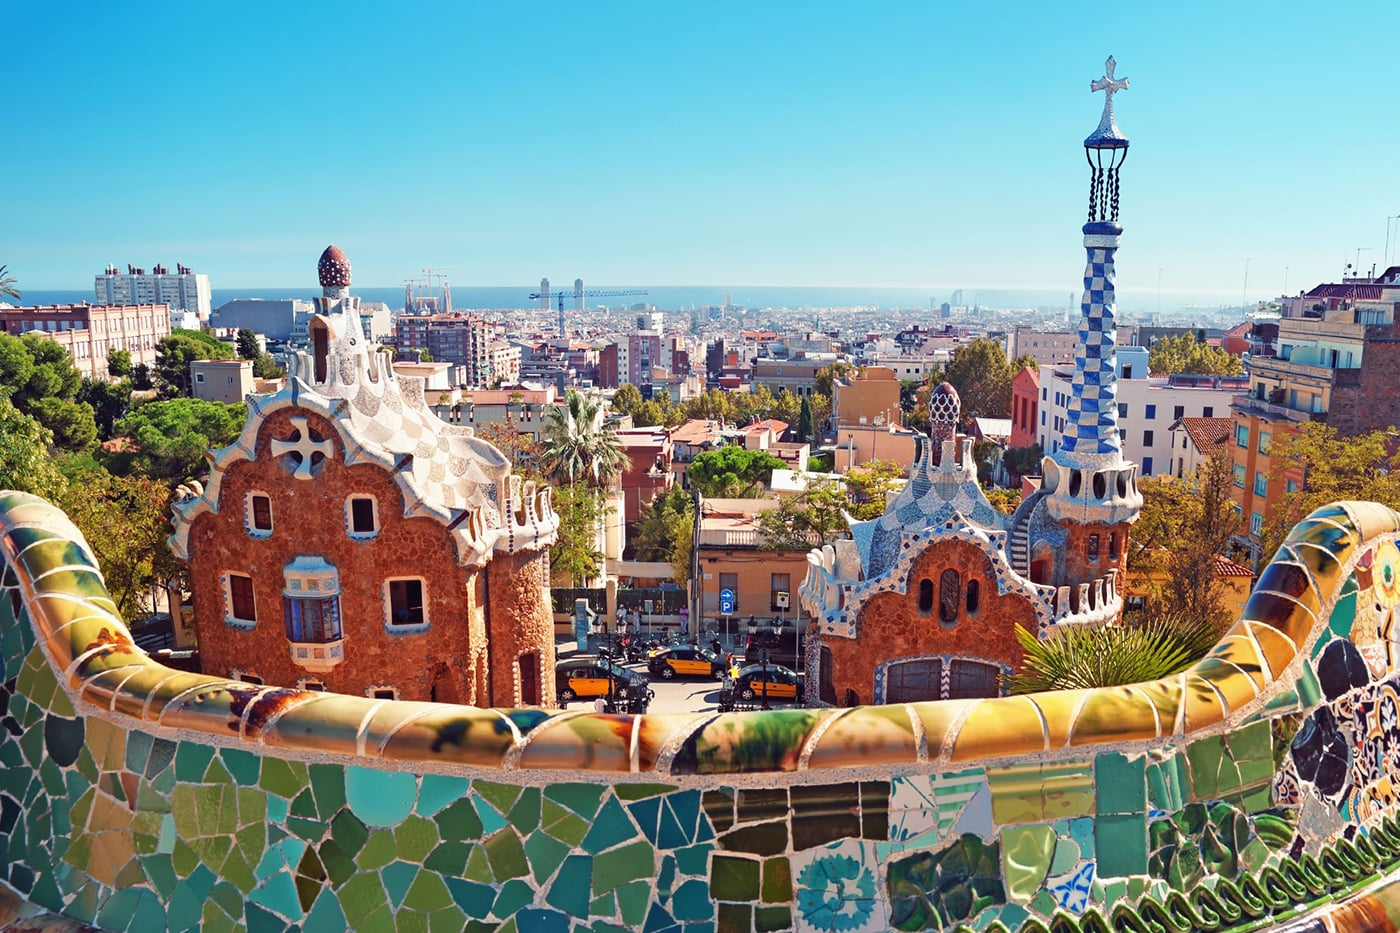 https://www.capitalonstage.com/wp-content/uploads/2017/06/Barcelona.jpg